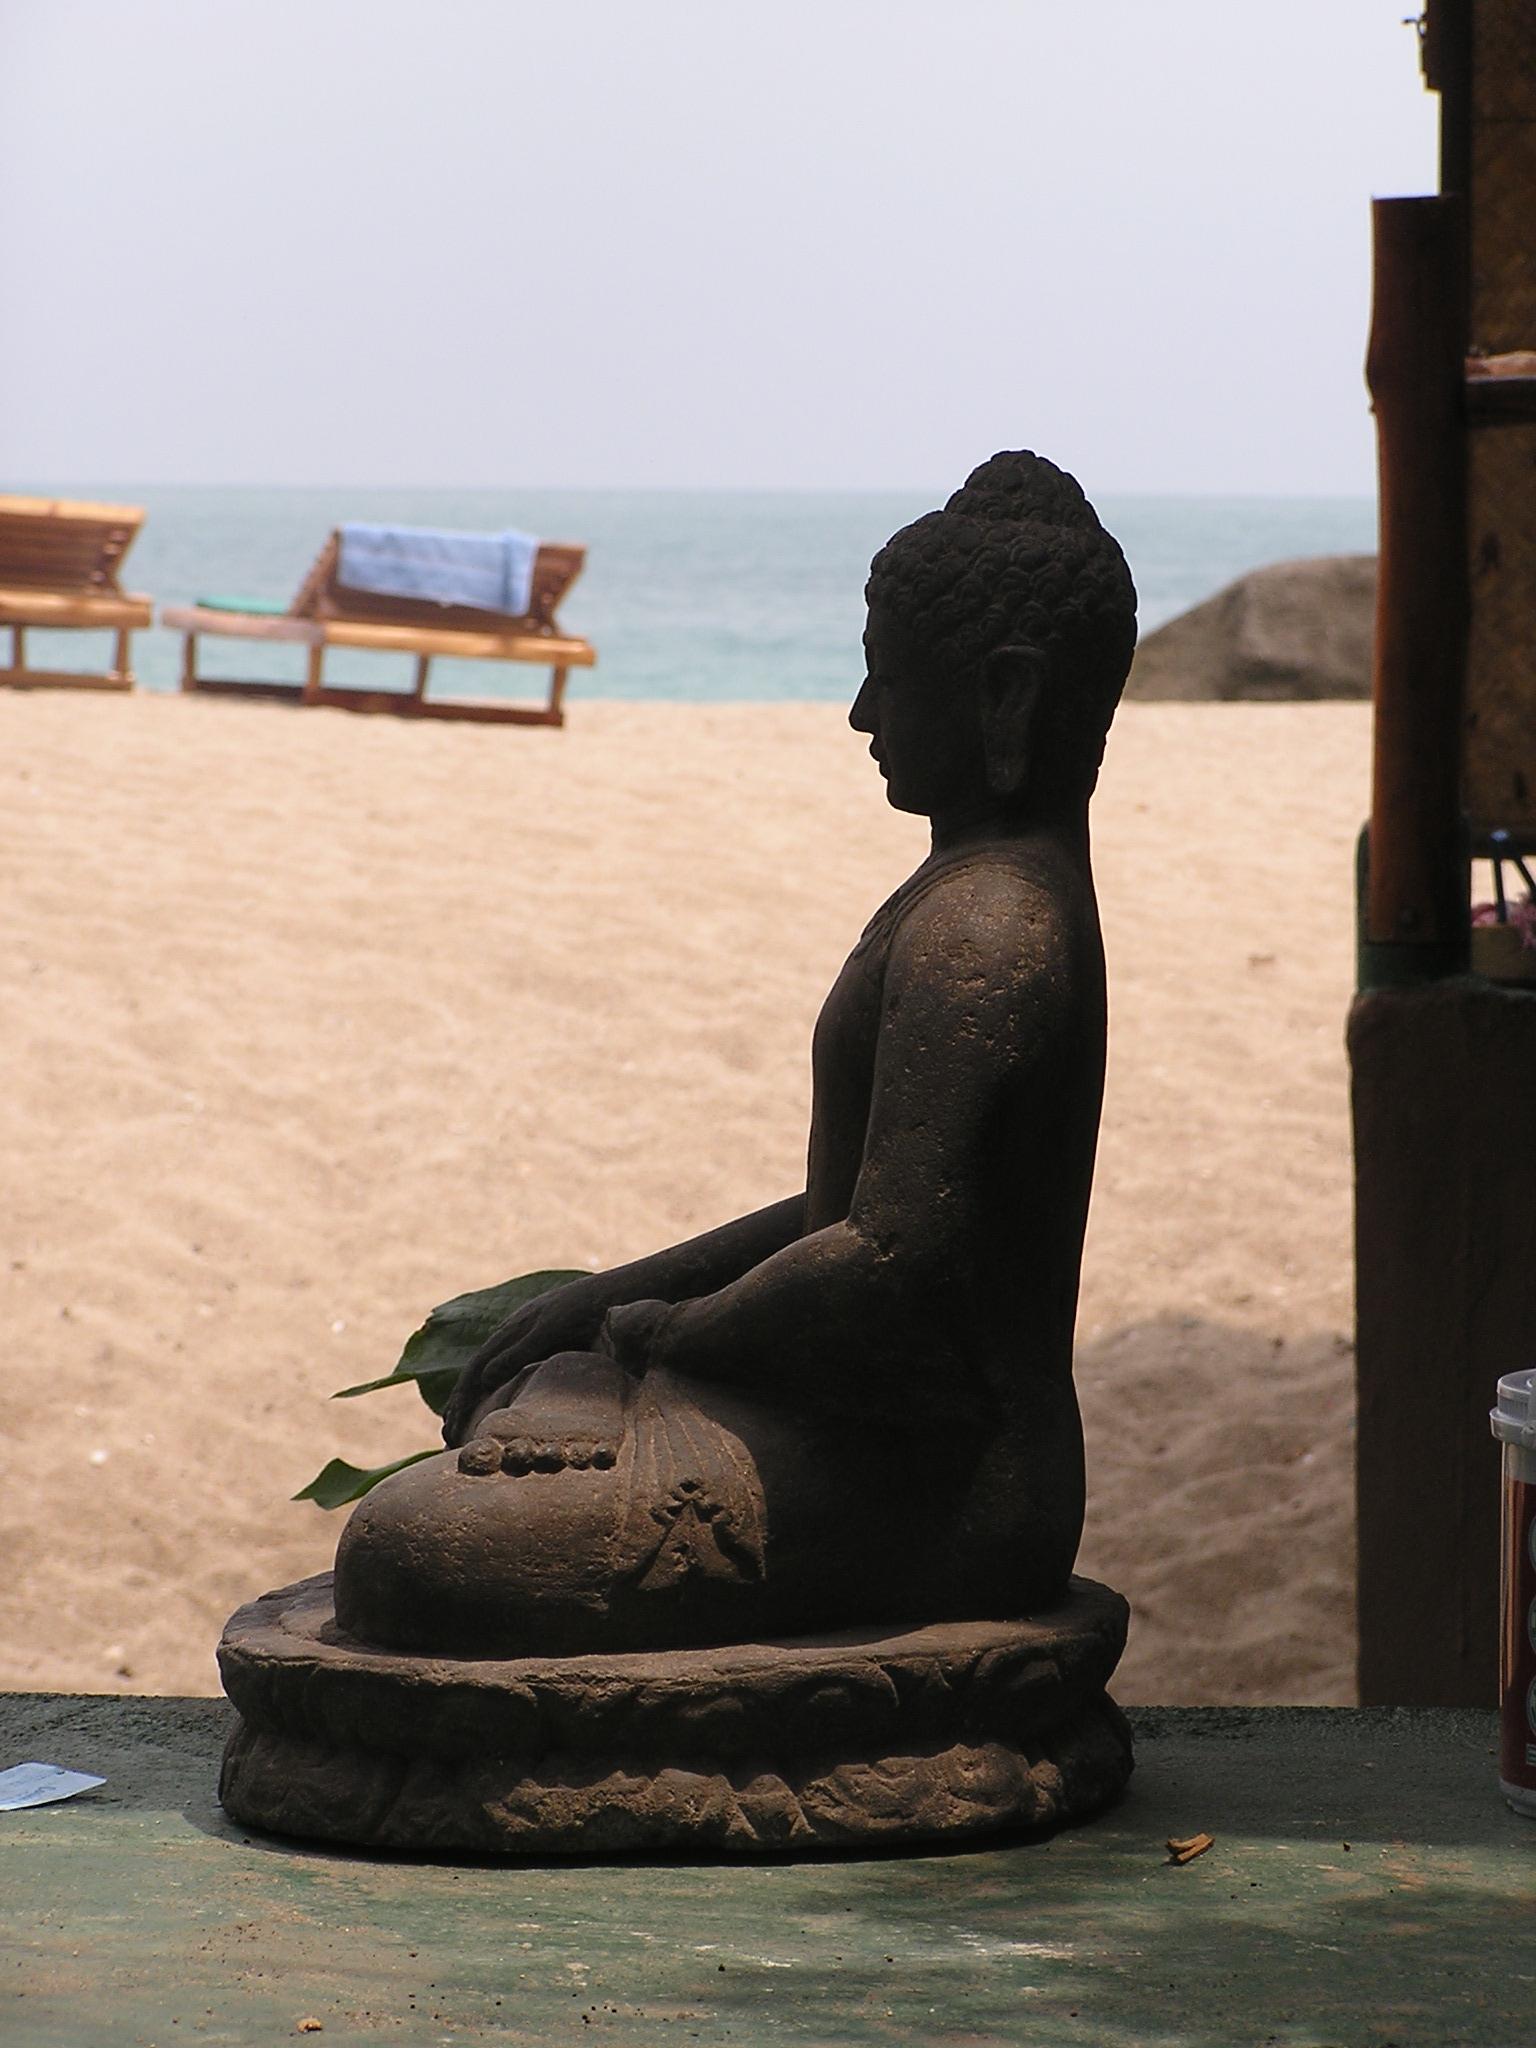 The ever present Buddhas